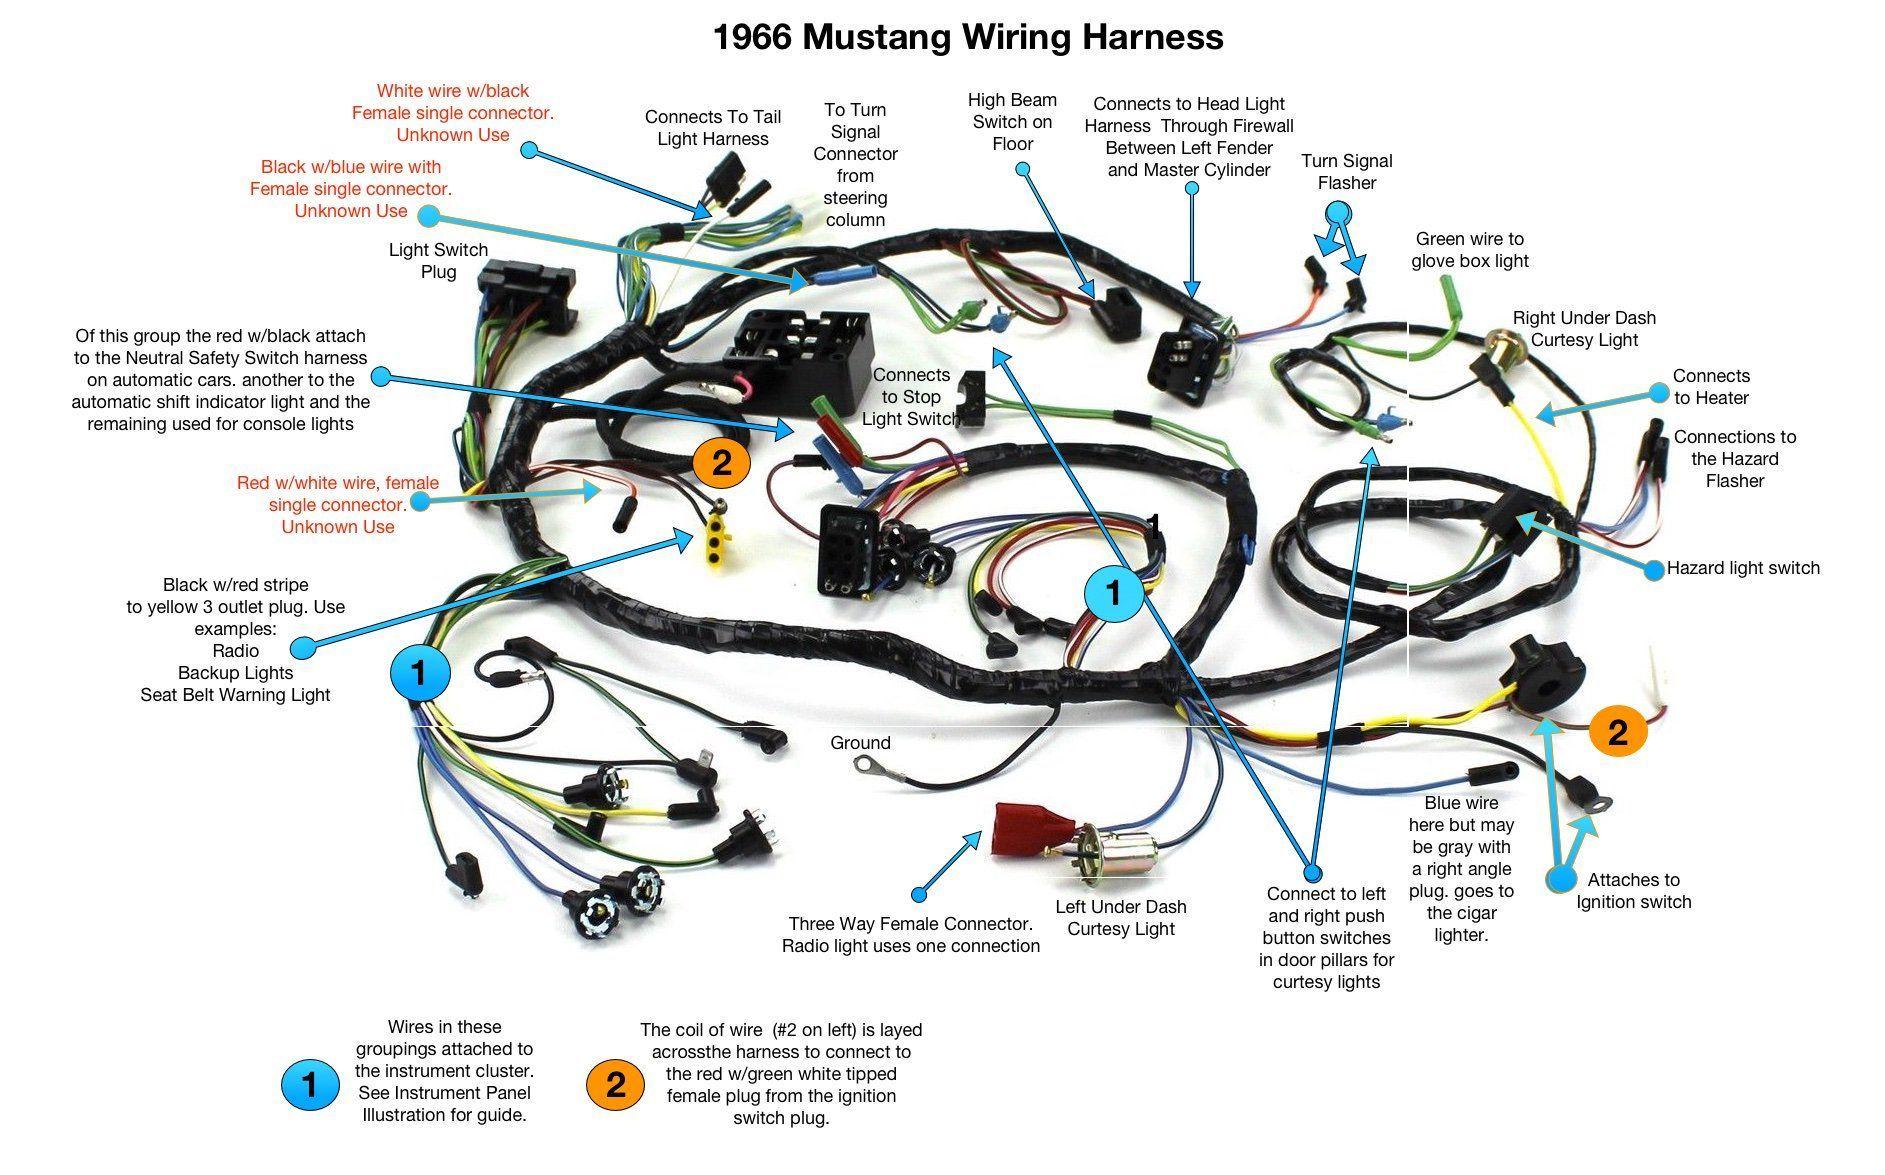 2005 Ford Explorer Wiring Harness Diagram   Electrical wiring diagram [ 1175 x 1885 Pixel ]